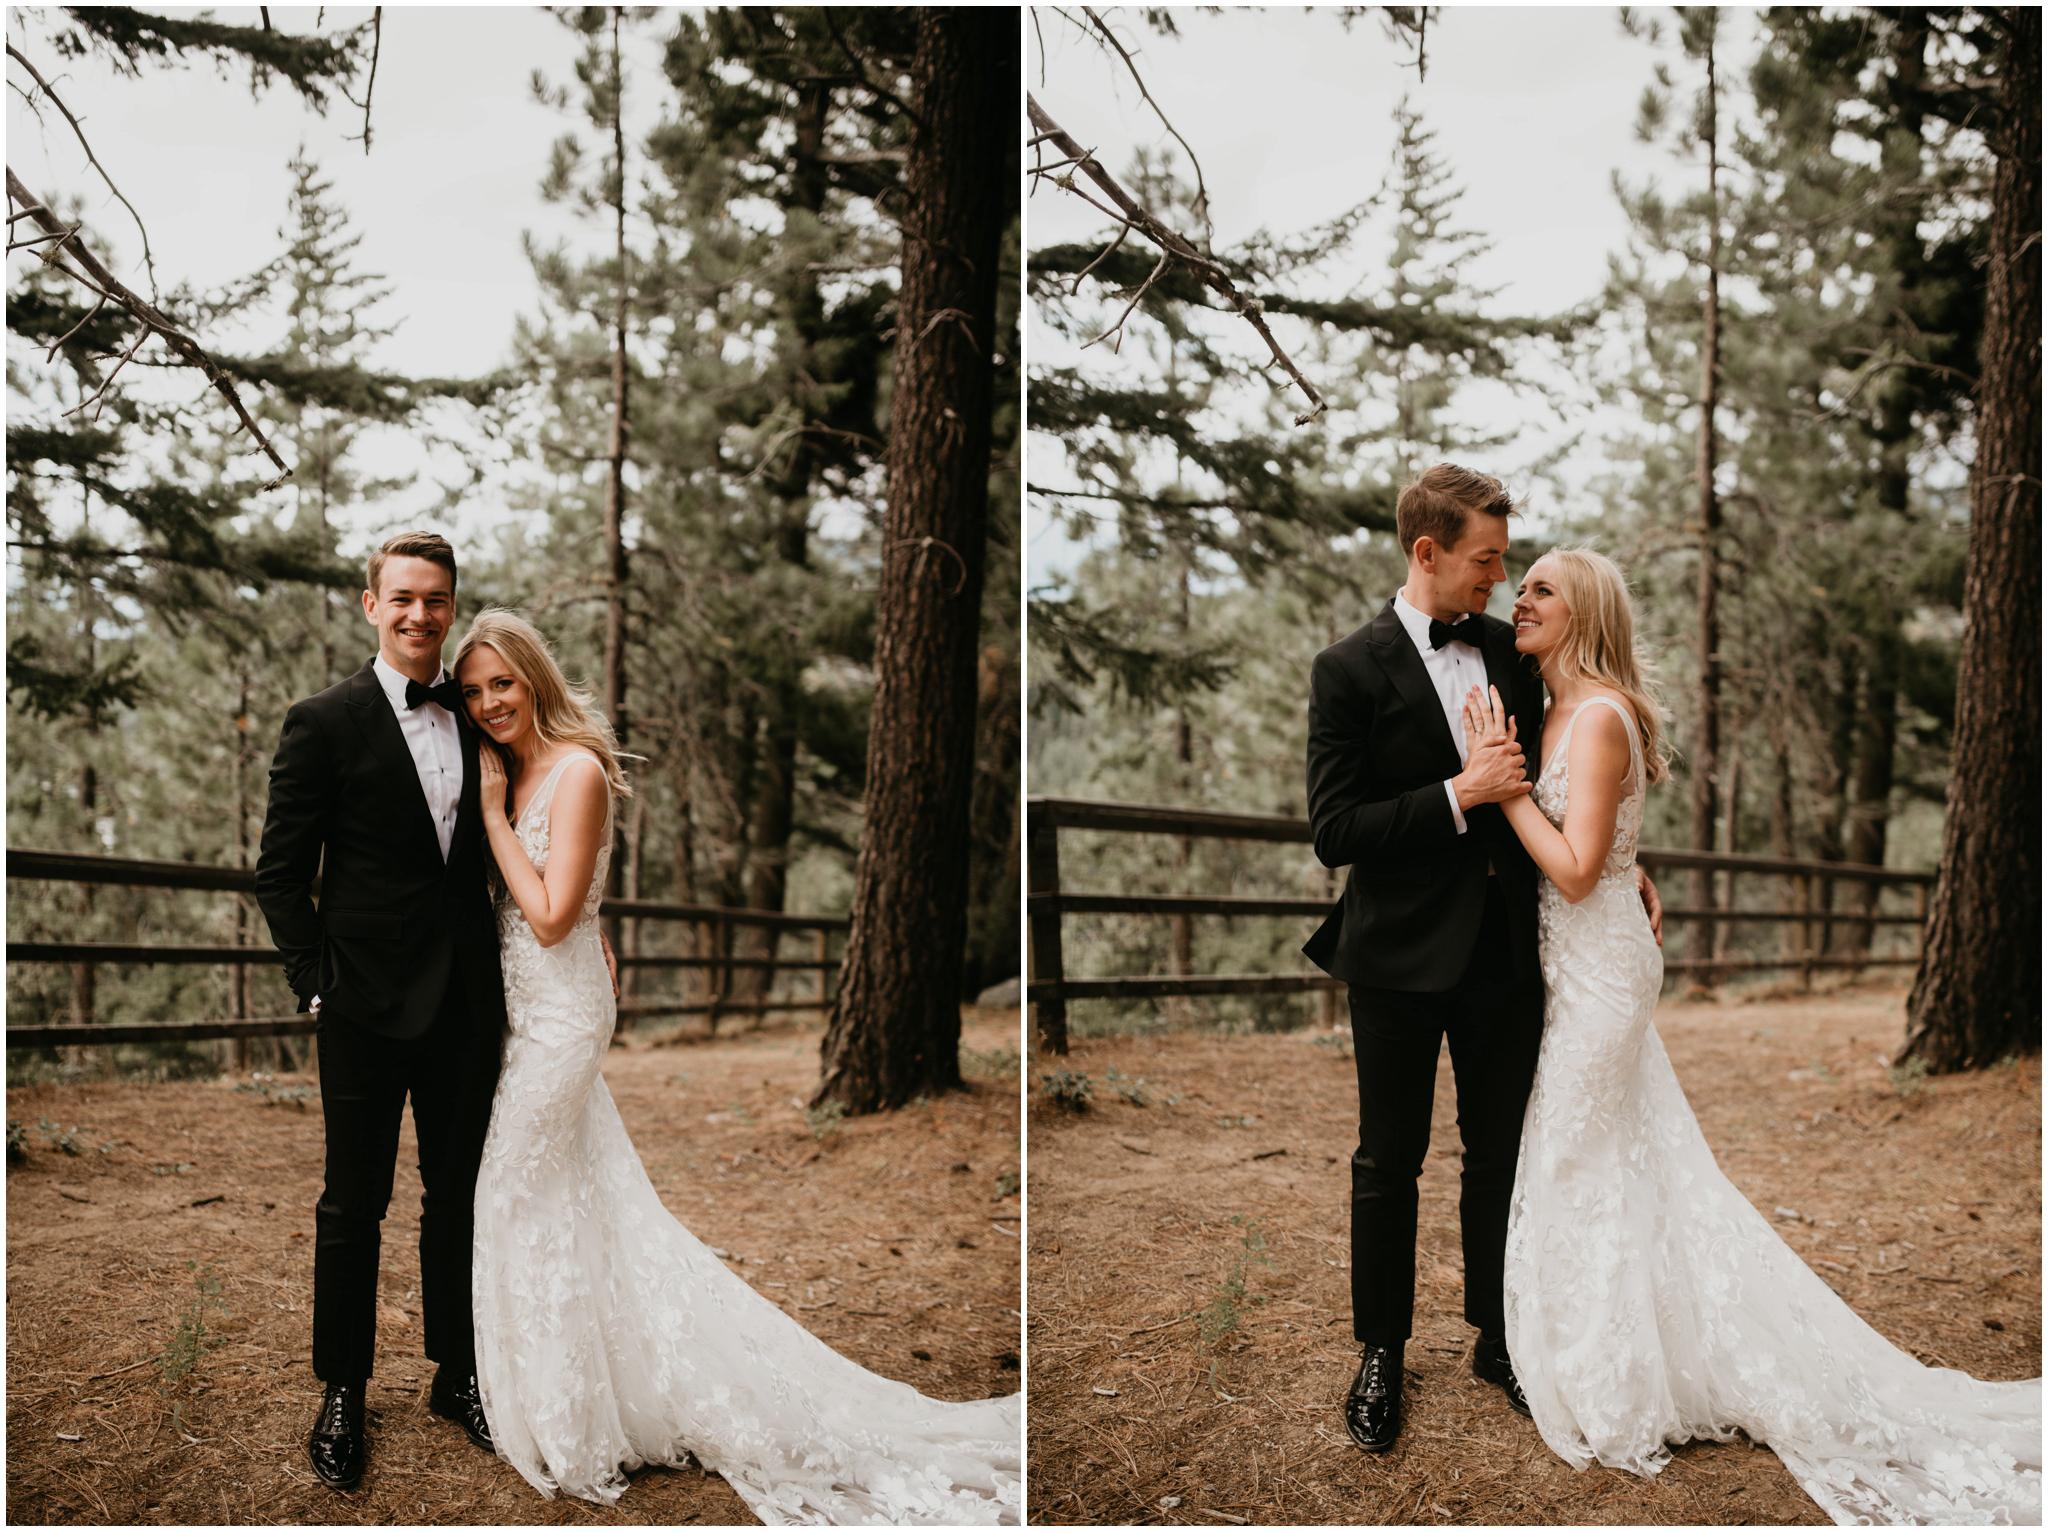 game-of-thrames-swifwater-cellars-seattle-wedding-photorapher-030.jpg